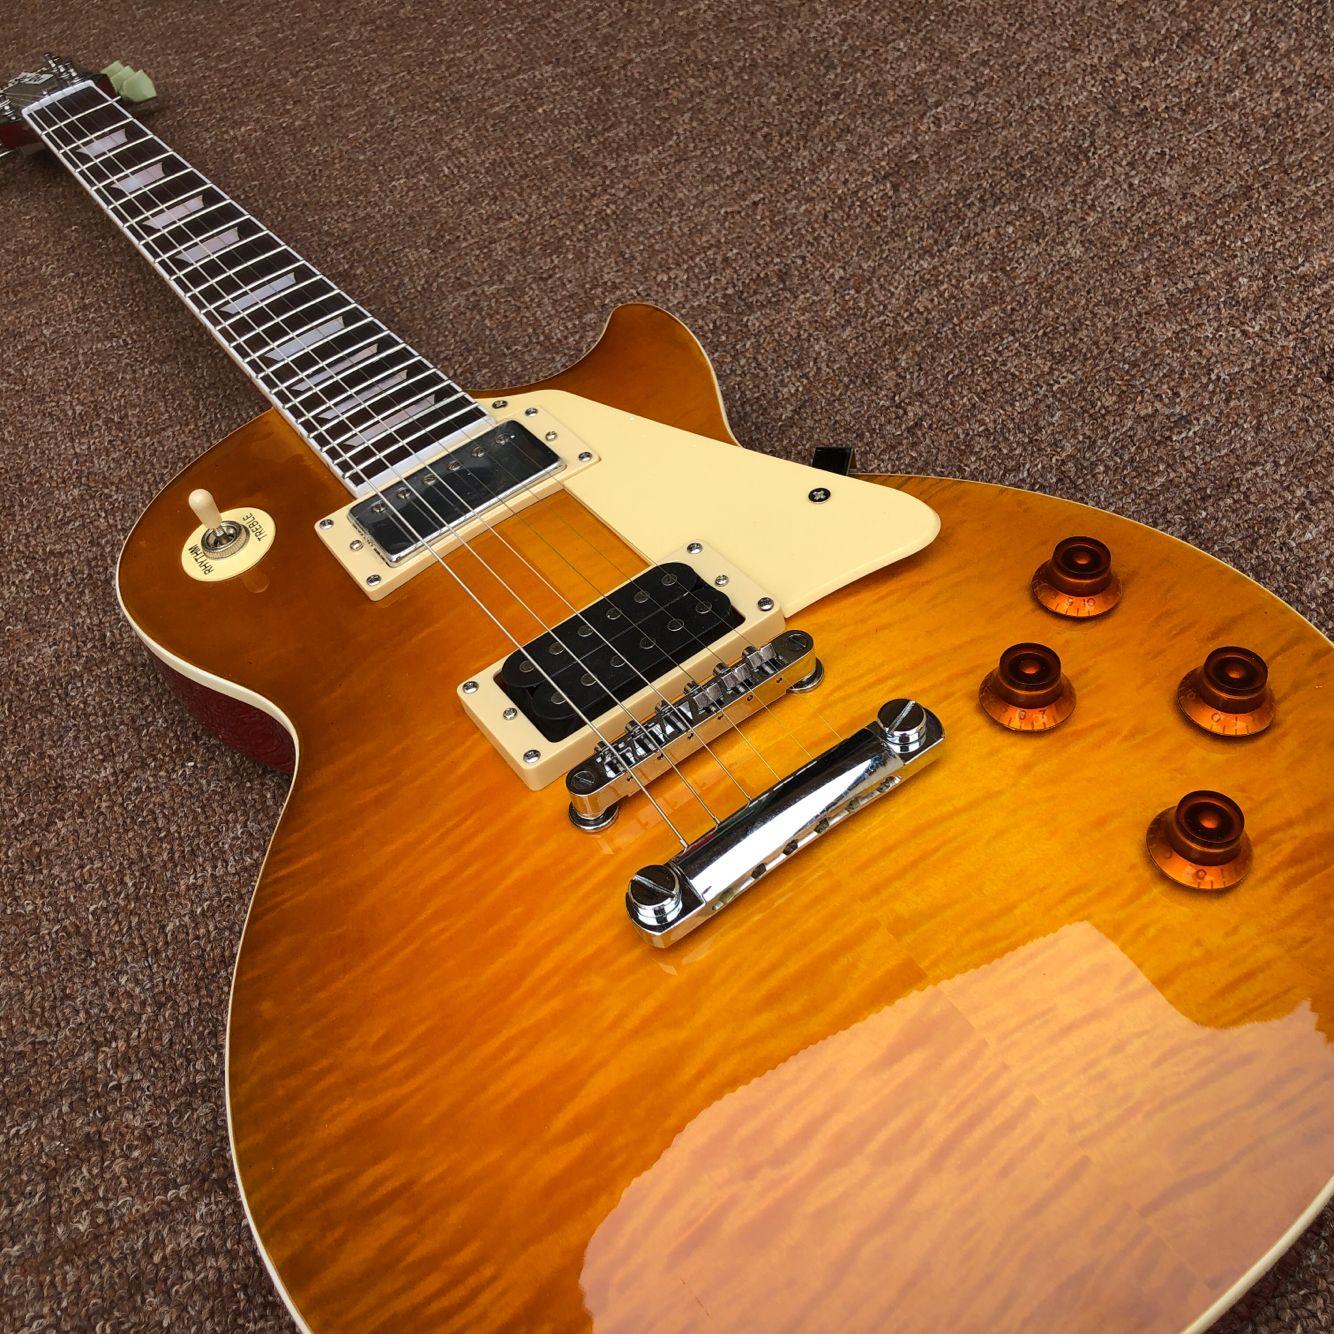 New standard Custom.Tiger Flame electric guitar.high quality pickups.rosewood fingerboard,mahogany body 6 Strings guitarra. enlarge